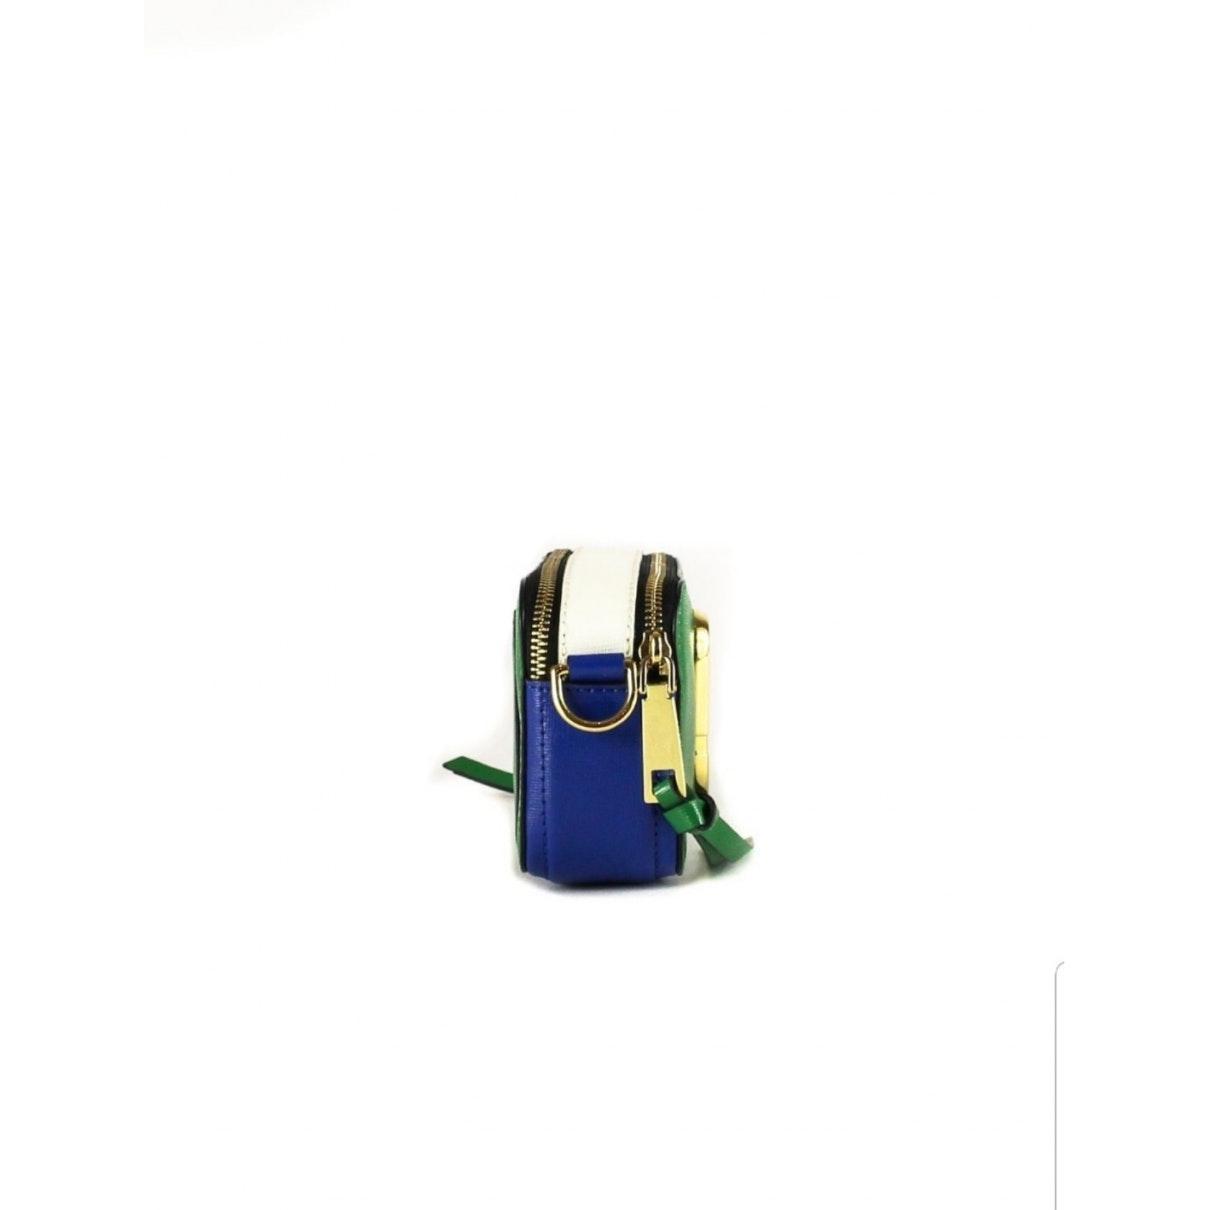 Sac à main Snapshot en Cuir Vert Marc Jacobs en coloris Vert 6t9h